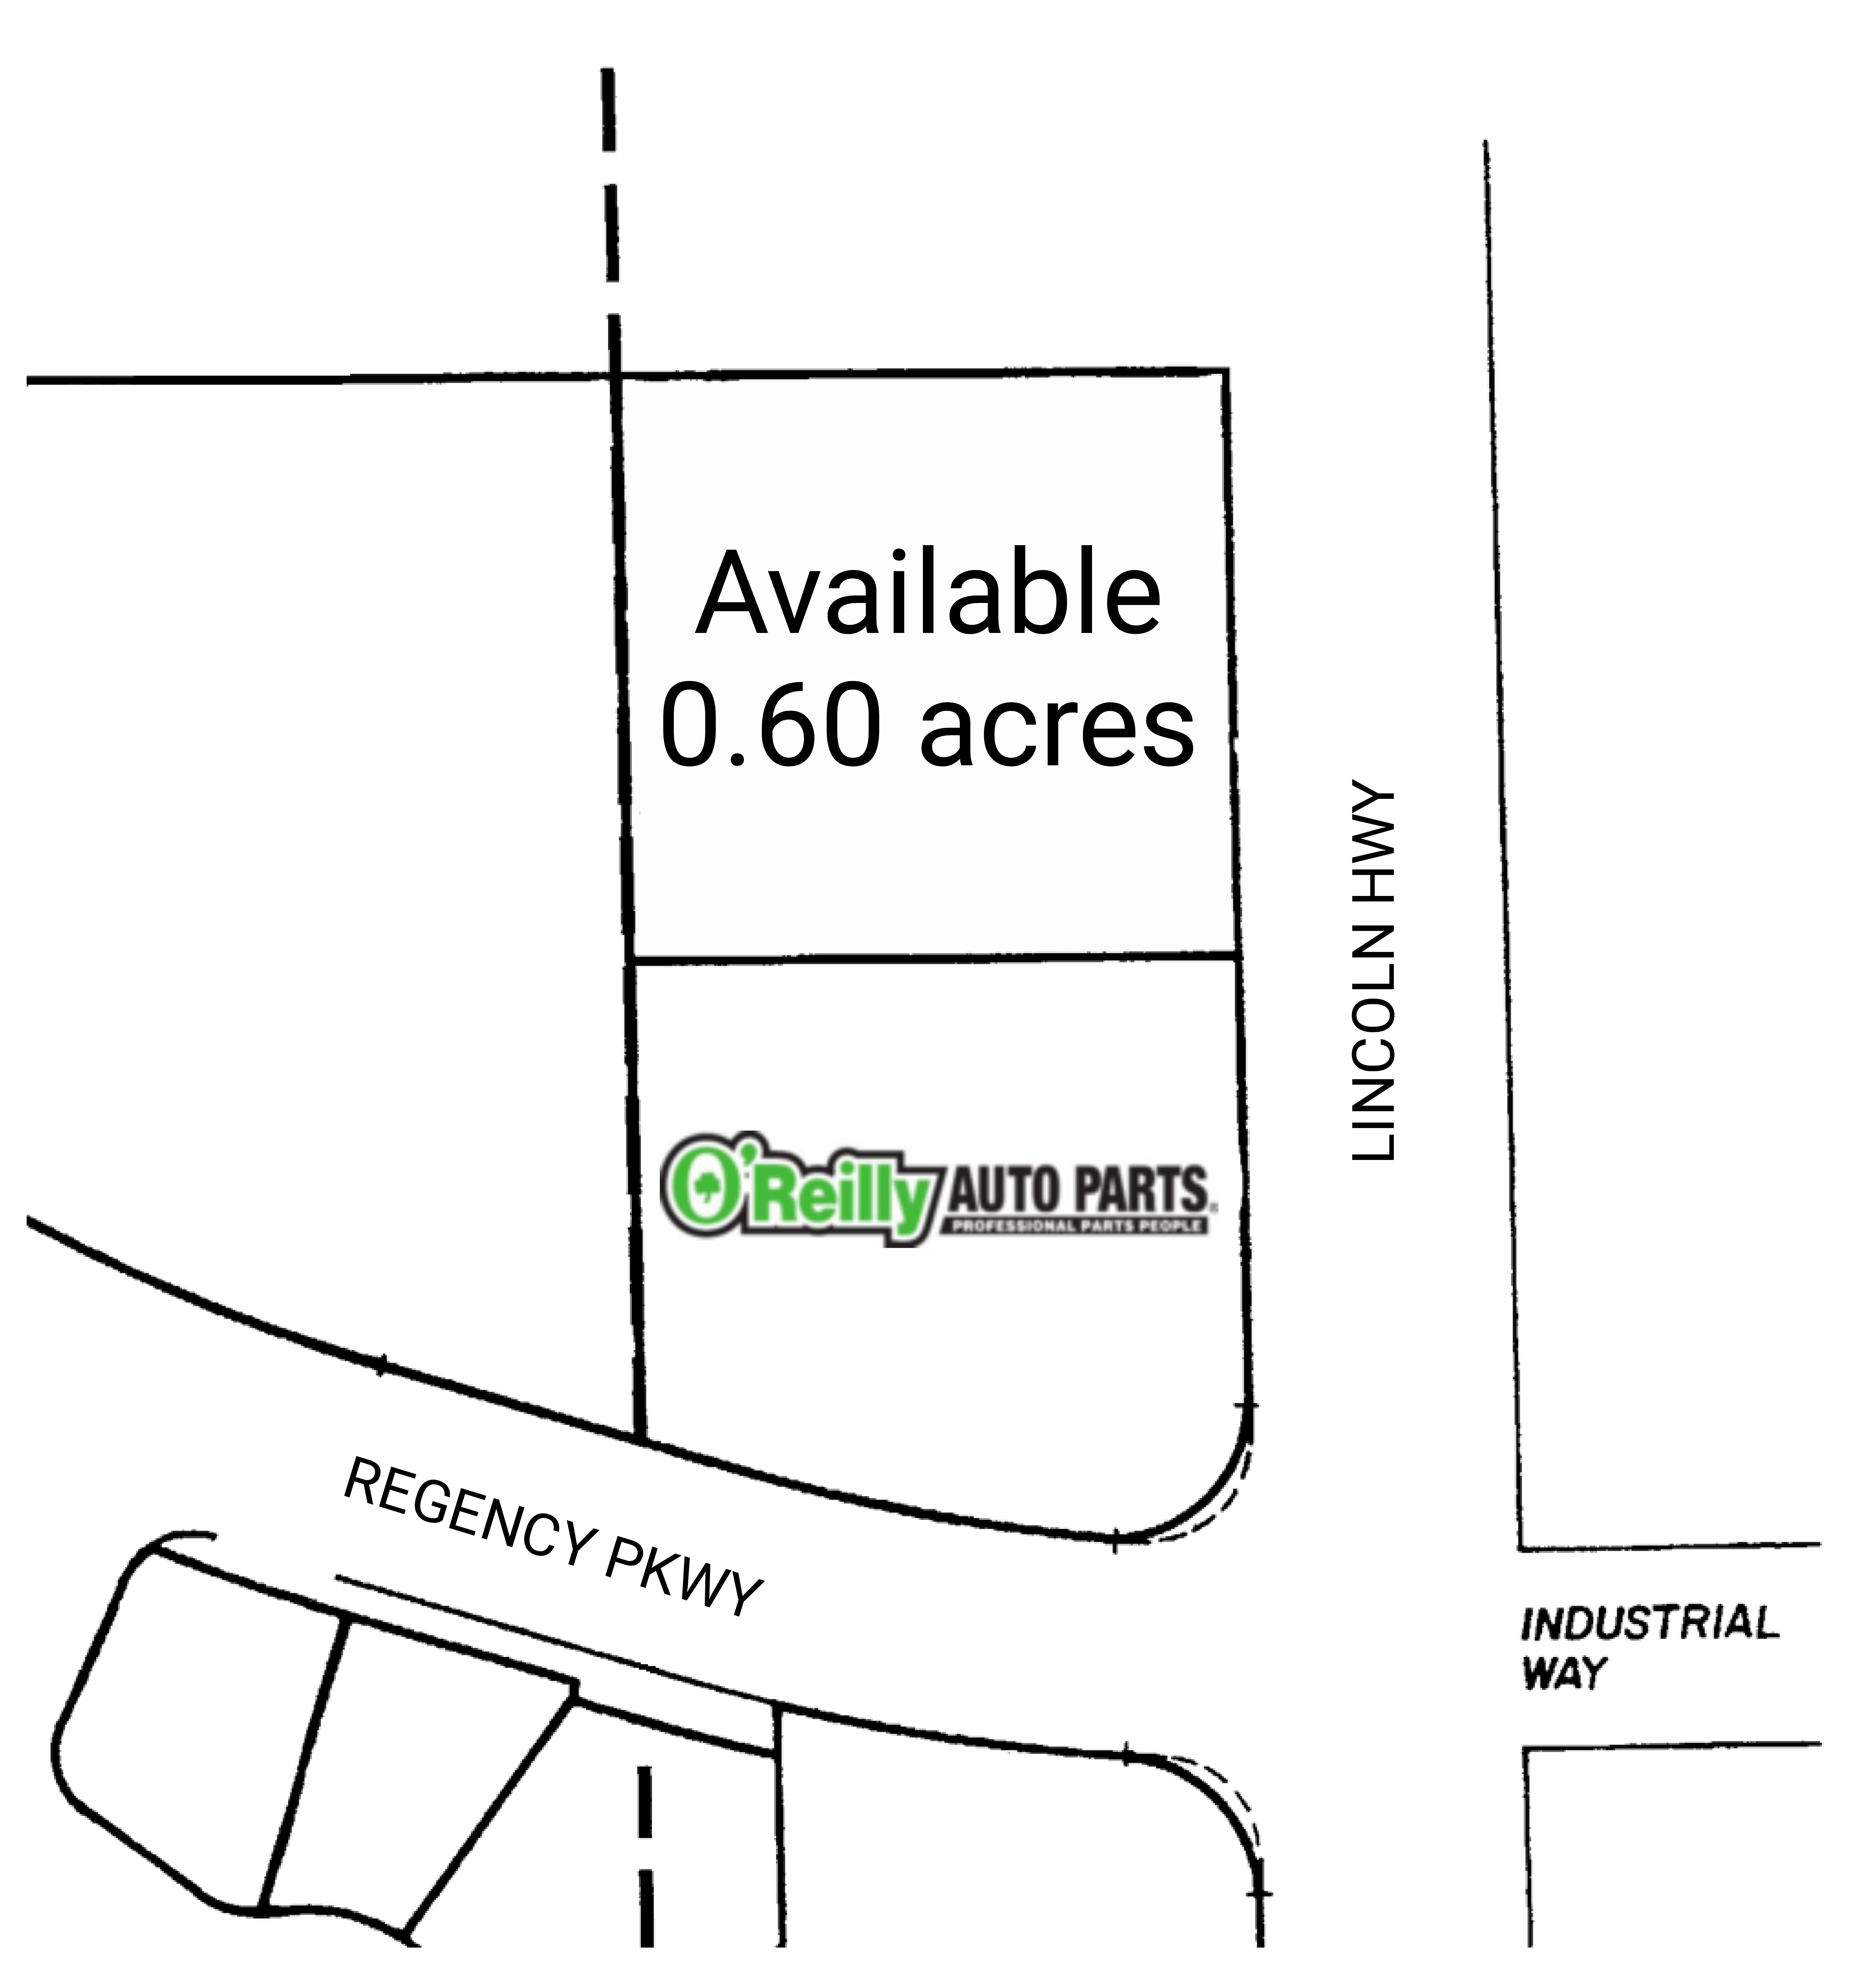 Dixon O'Reillys Land: site plan